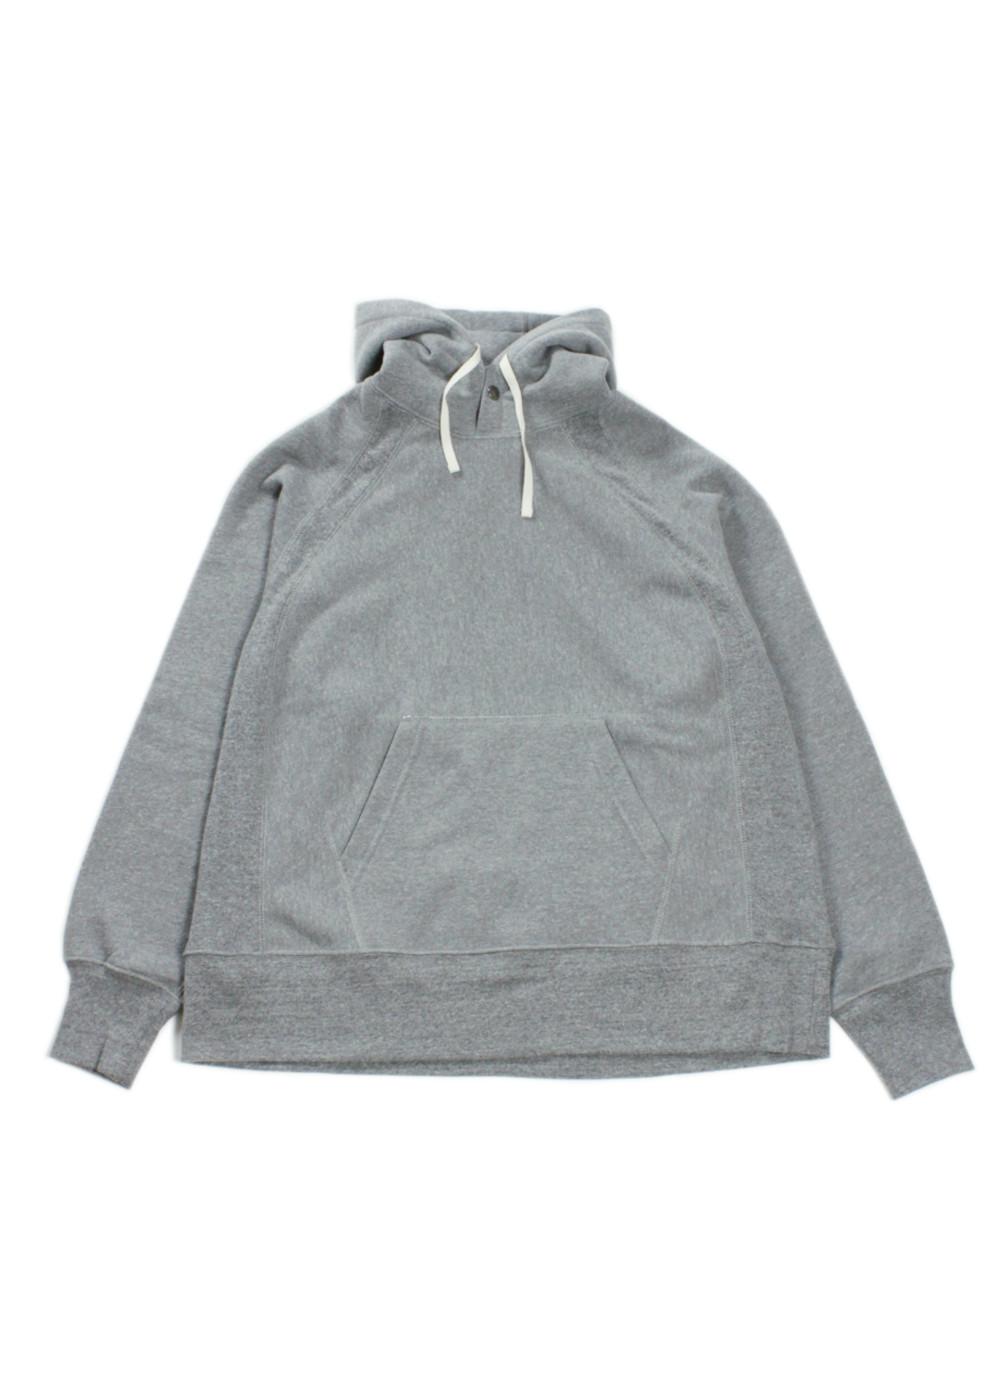 Engineered-Garments-Plain-Raglan-Hoody-Gray-01